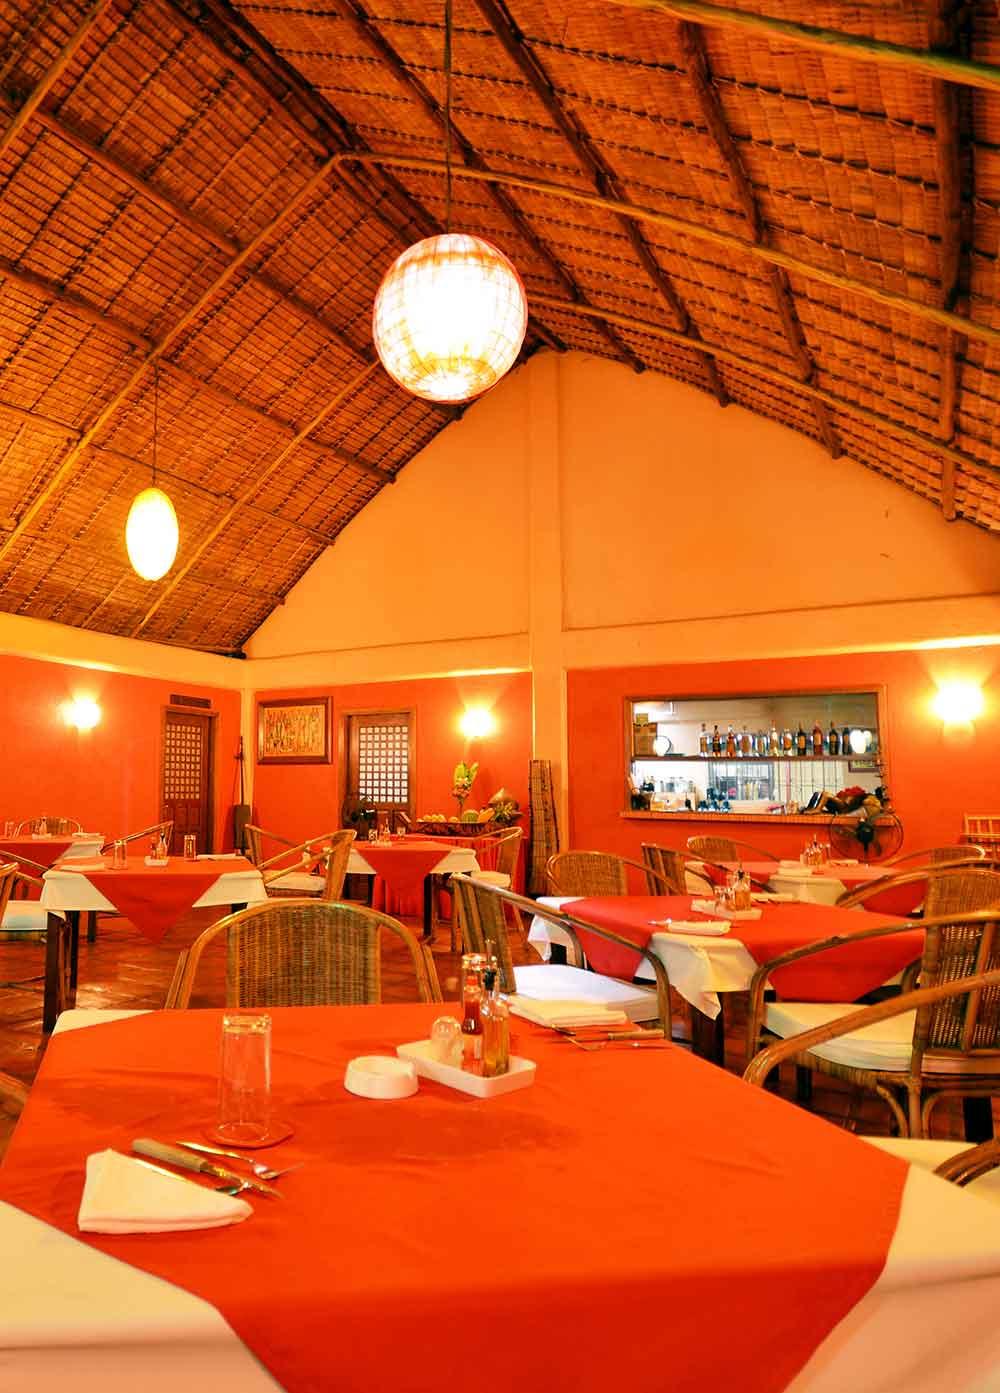 Hibiscus Garden Inn - Restaurant & Pizzeria